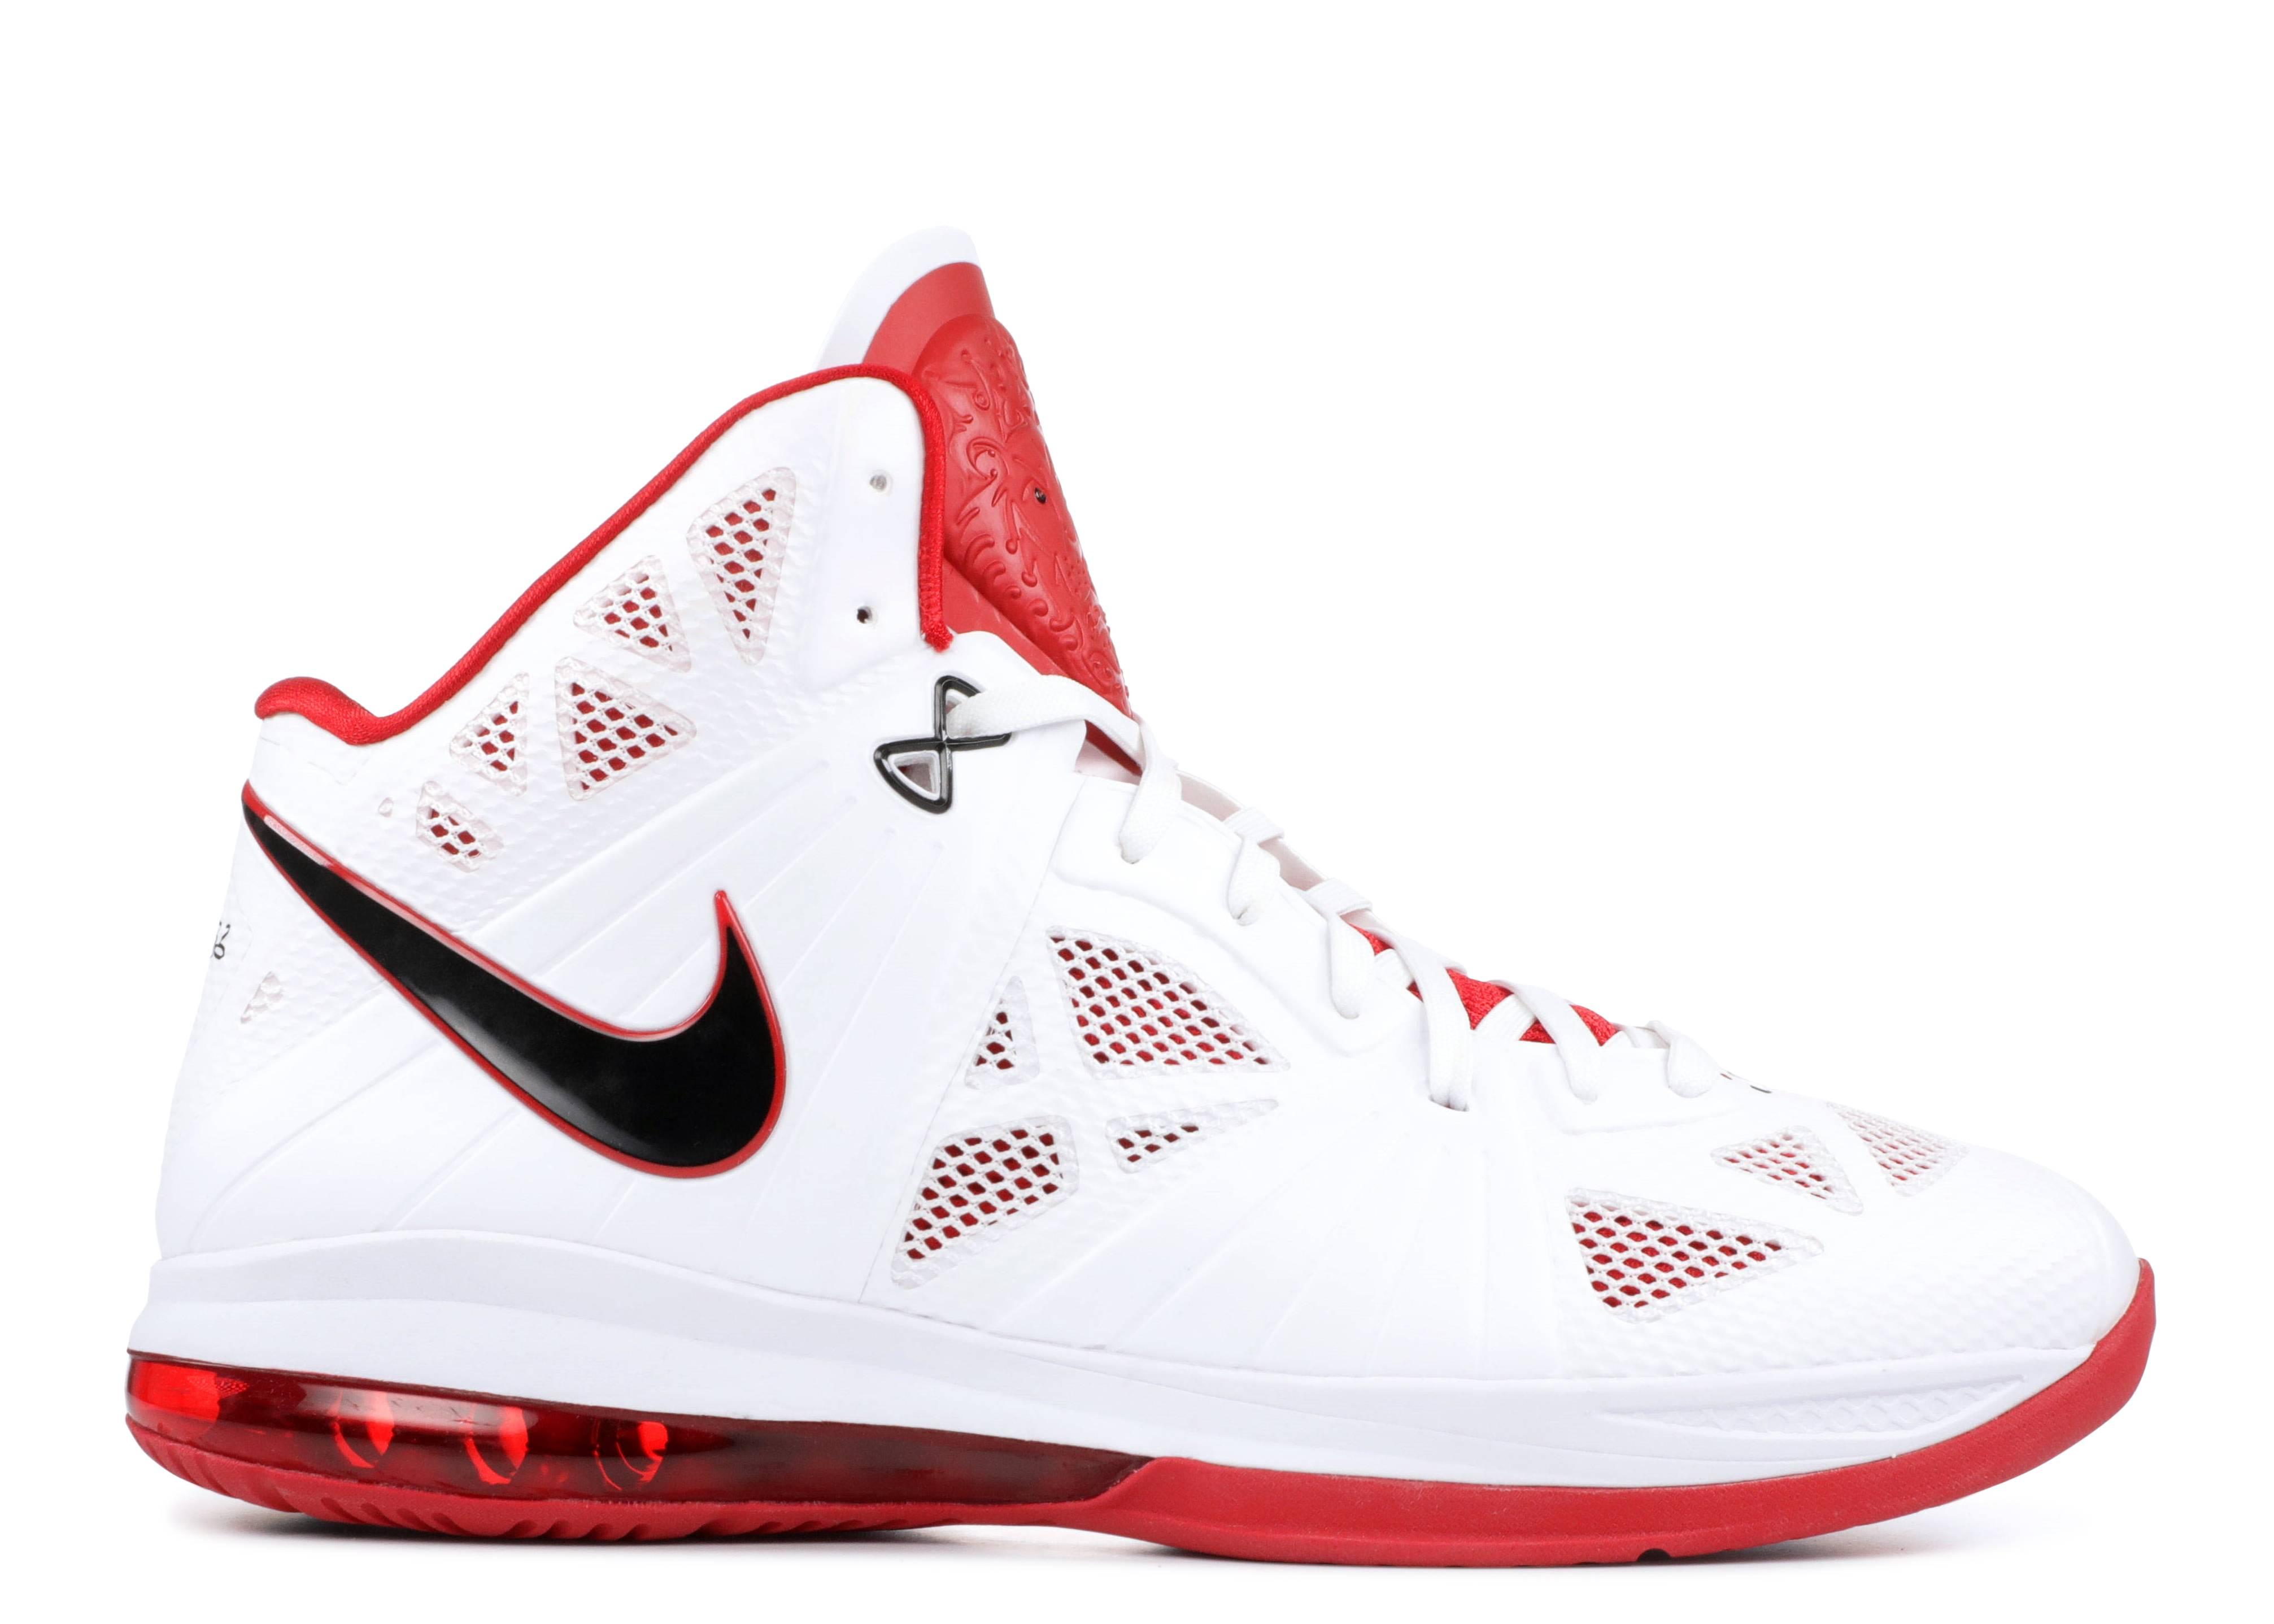 ac16fa65bb7f Lebron 8 P.s. - Nike - 441946 100 - white black-sport red